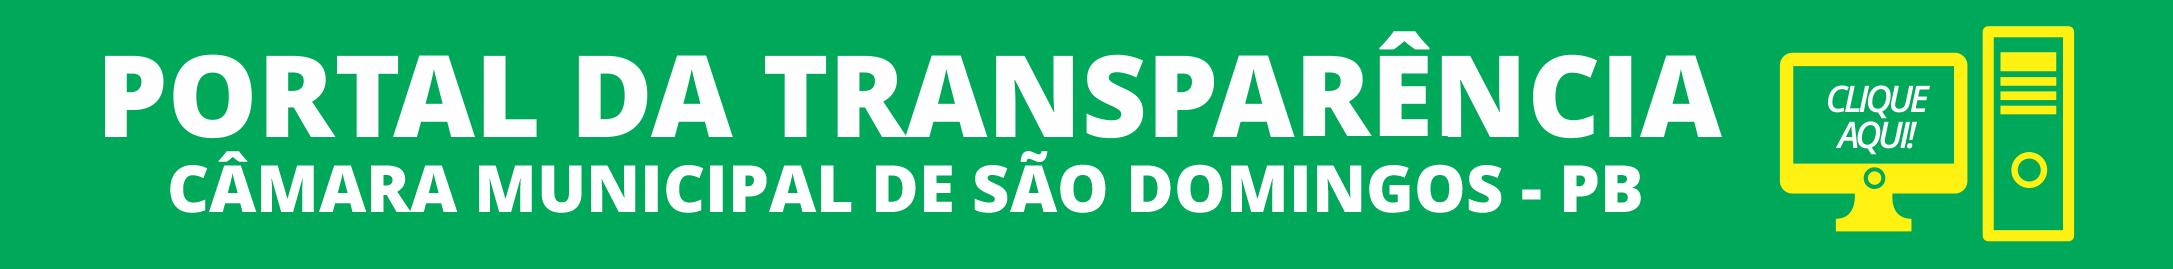 Portal da Trasnparência